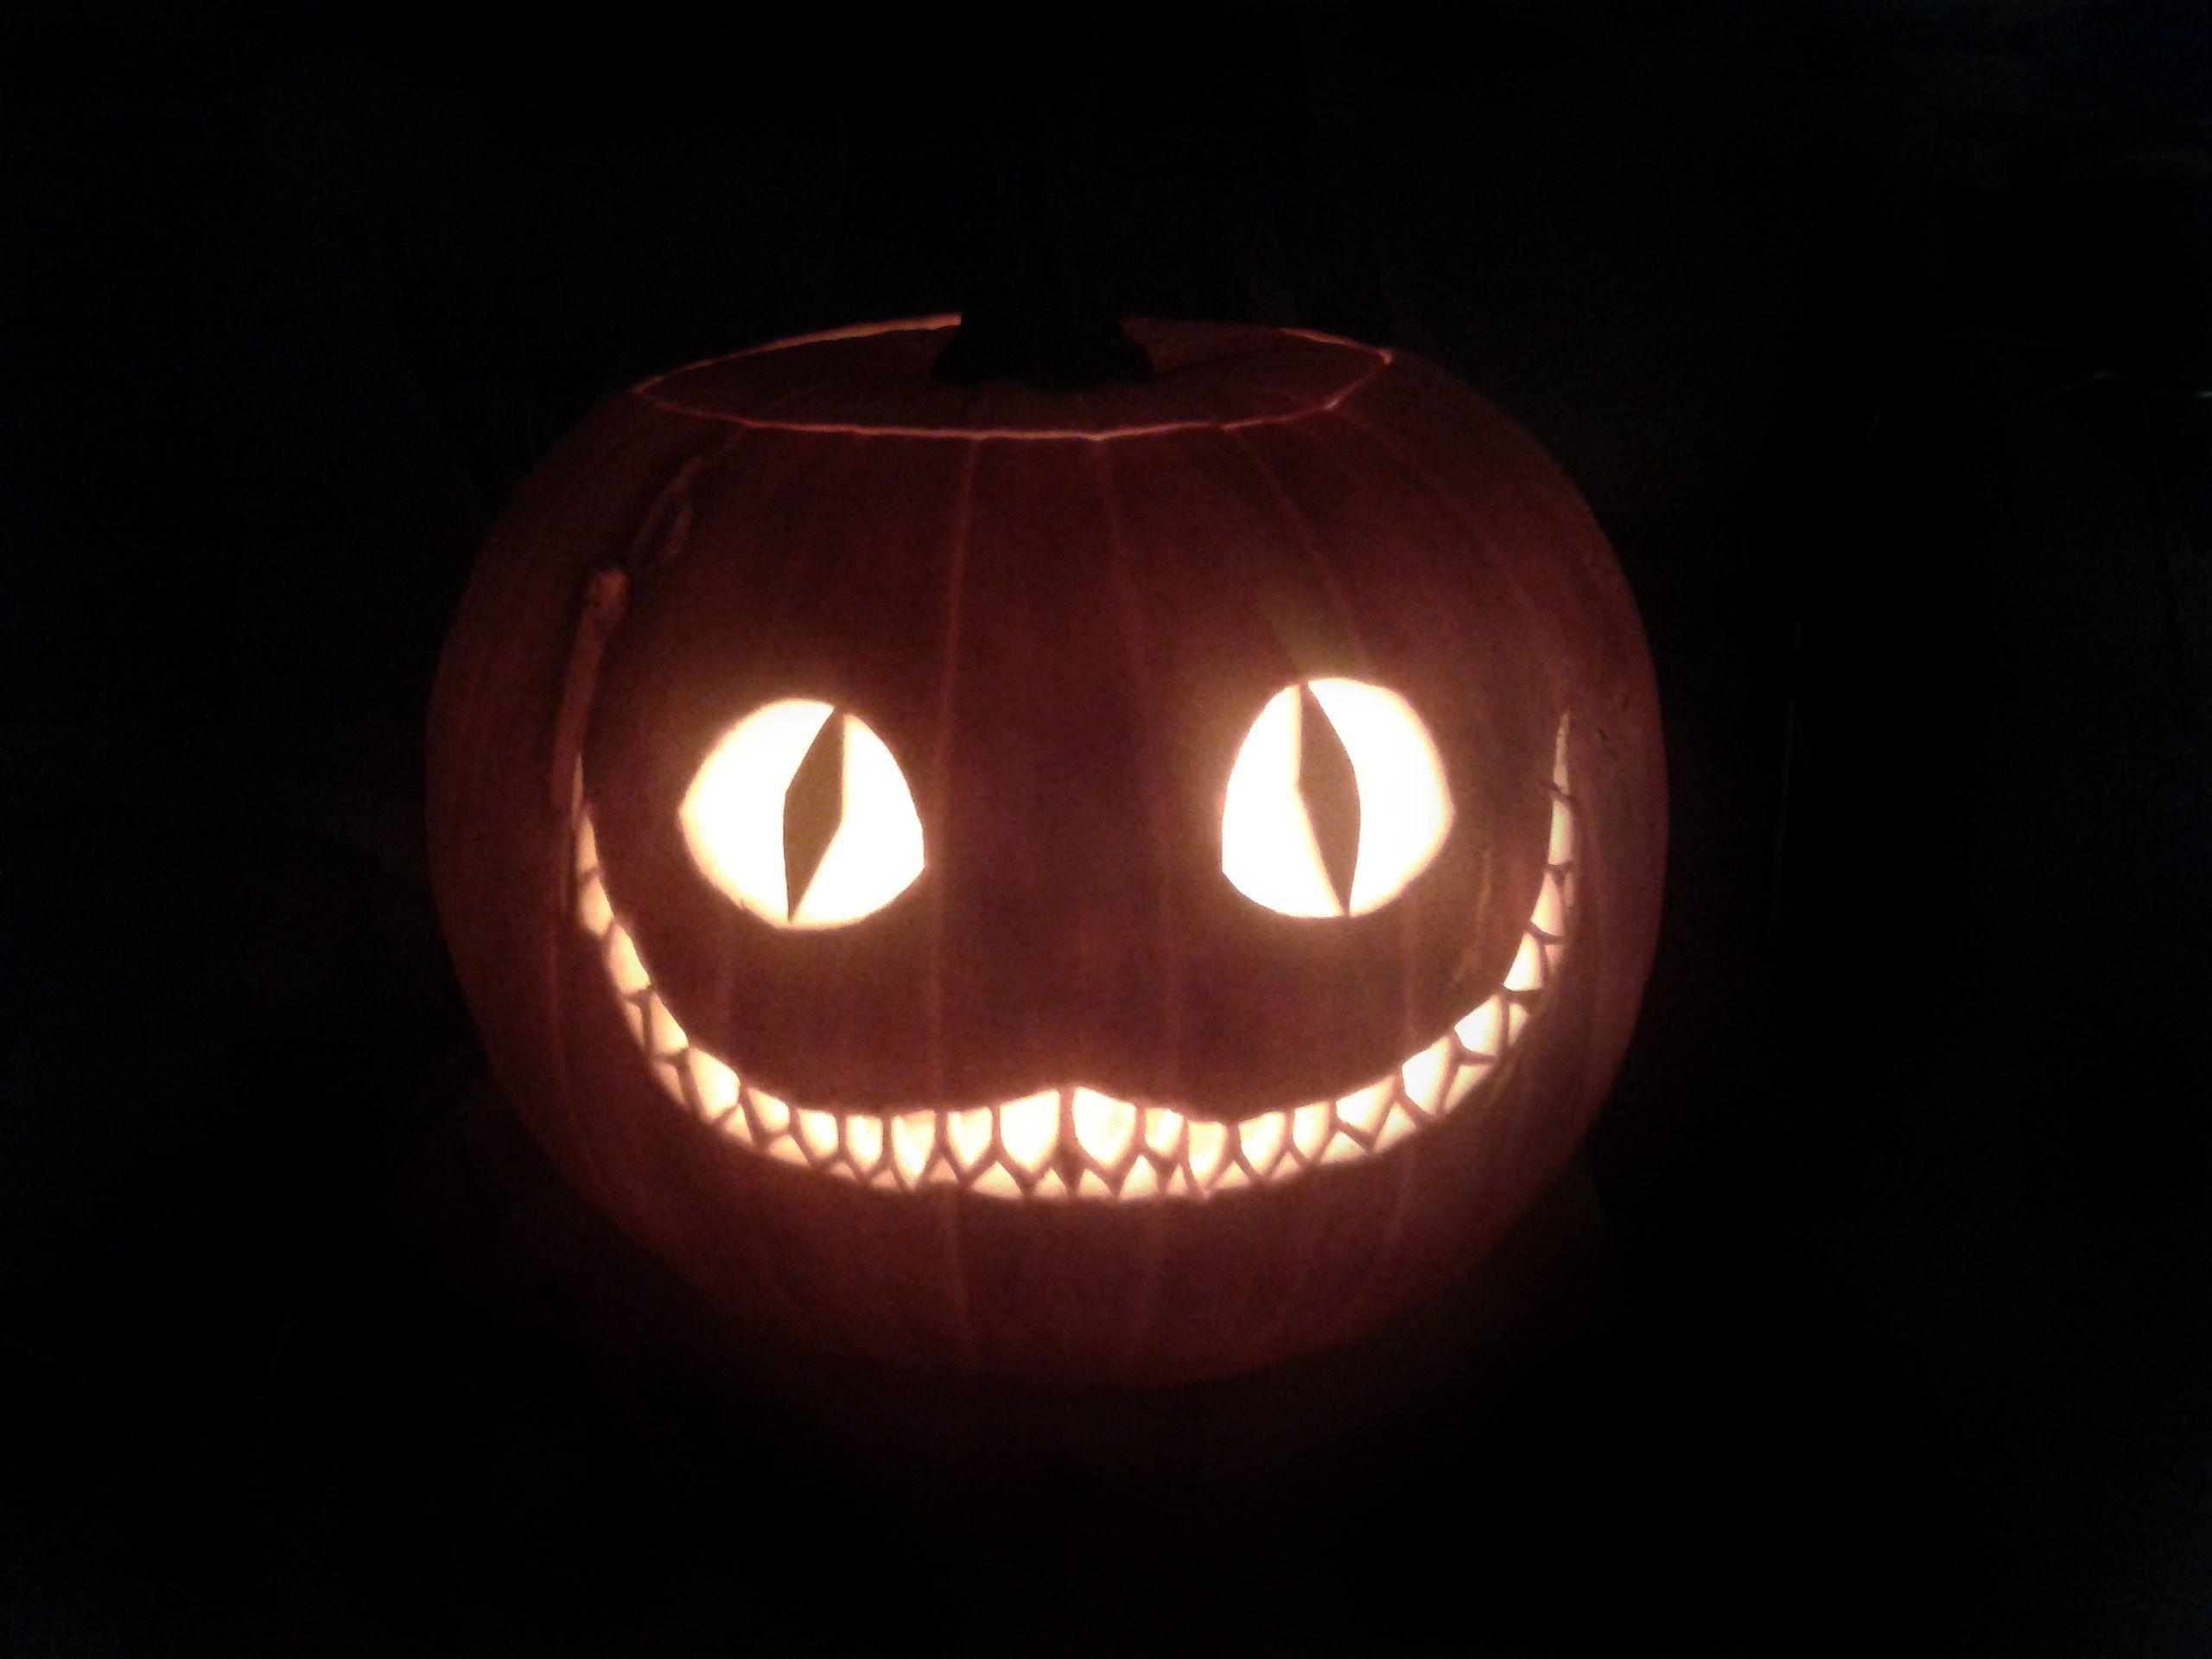 Wa walking dead pumpkin stencil - Halloween Pumpkin Carving Scarry Cheshire Cat